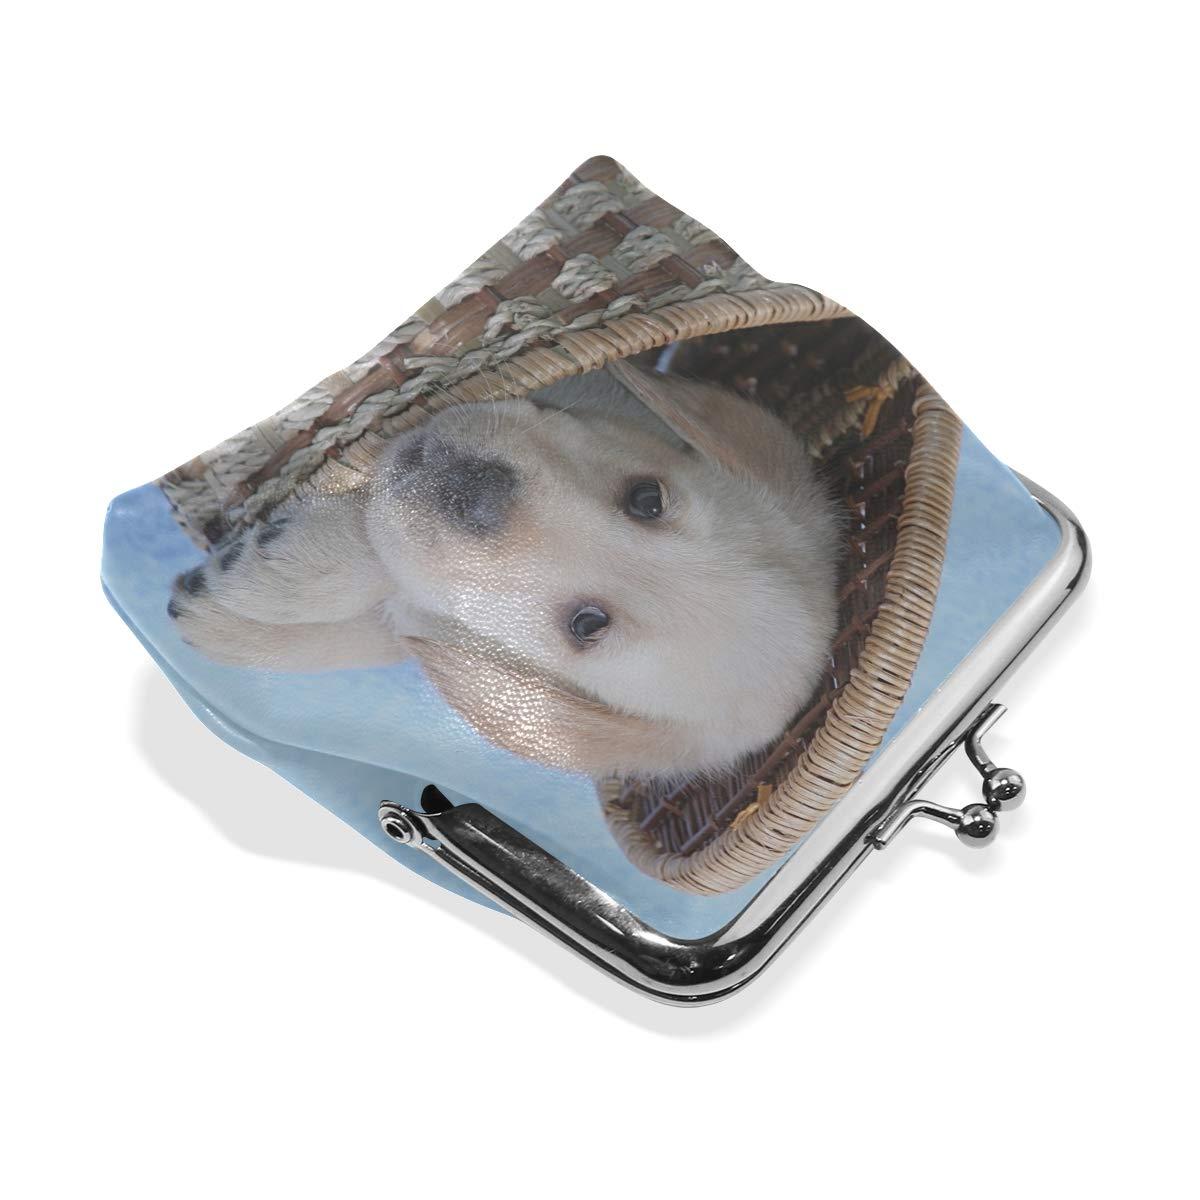 Rh Studio Coin Purse Clasp Closure Dog Labrador Basket Muzzle Print Wallet Exquisite Coin Pouch Girls Women Clutch Handbag Exquisite Gift